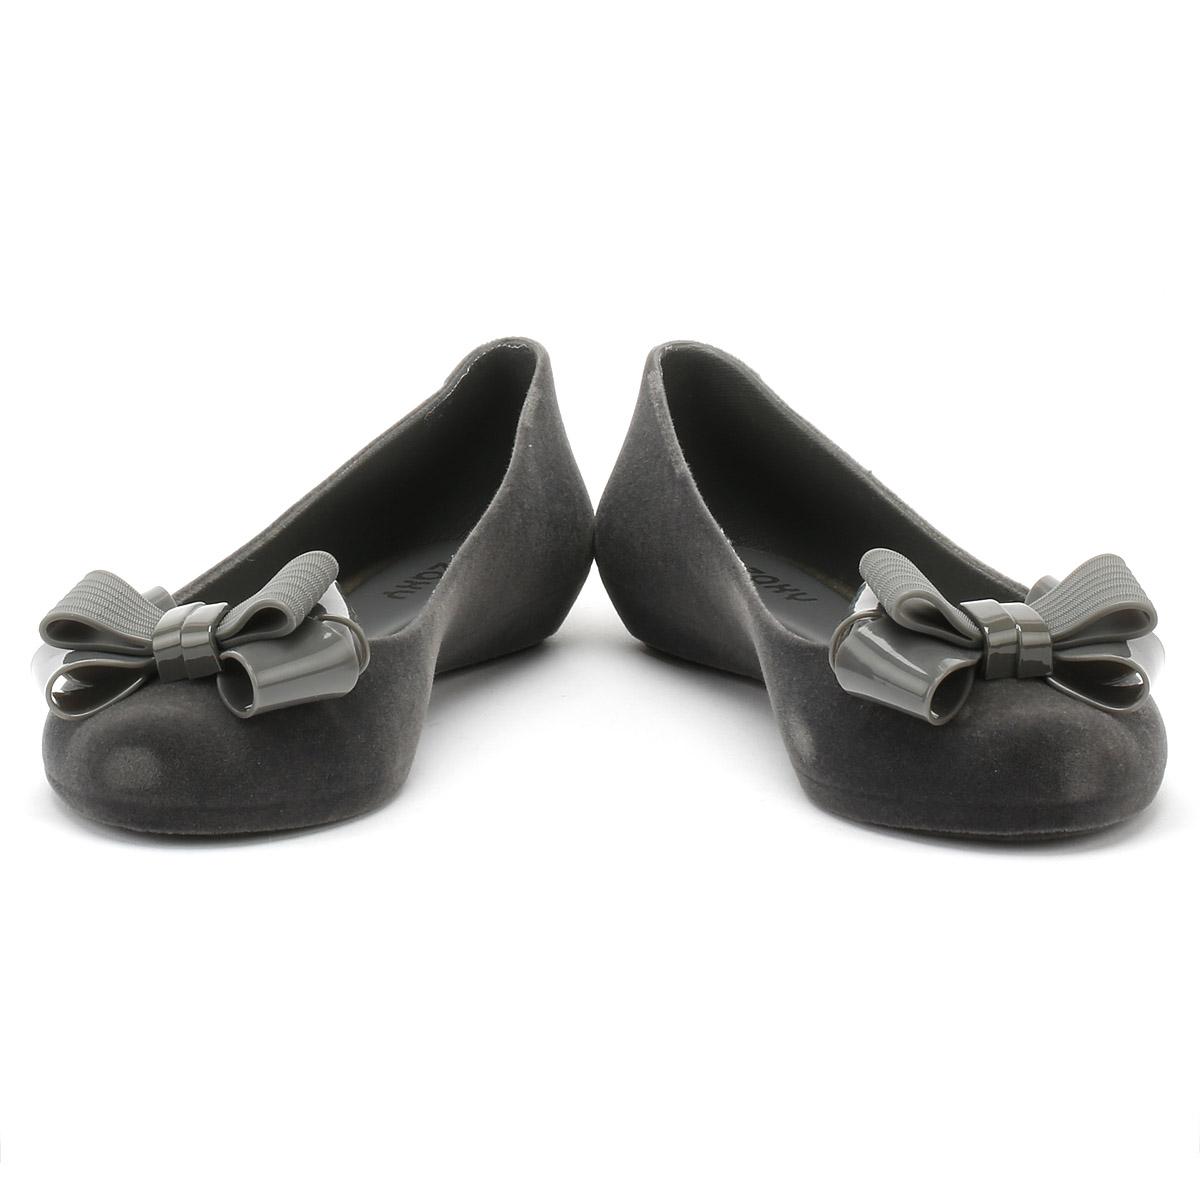 Zaxy Women Pop Flock 2 Grey Flats Shoes Ballerinas New In